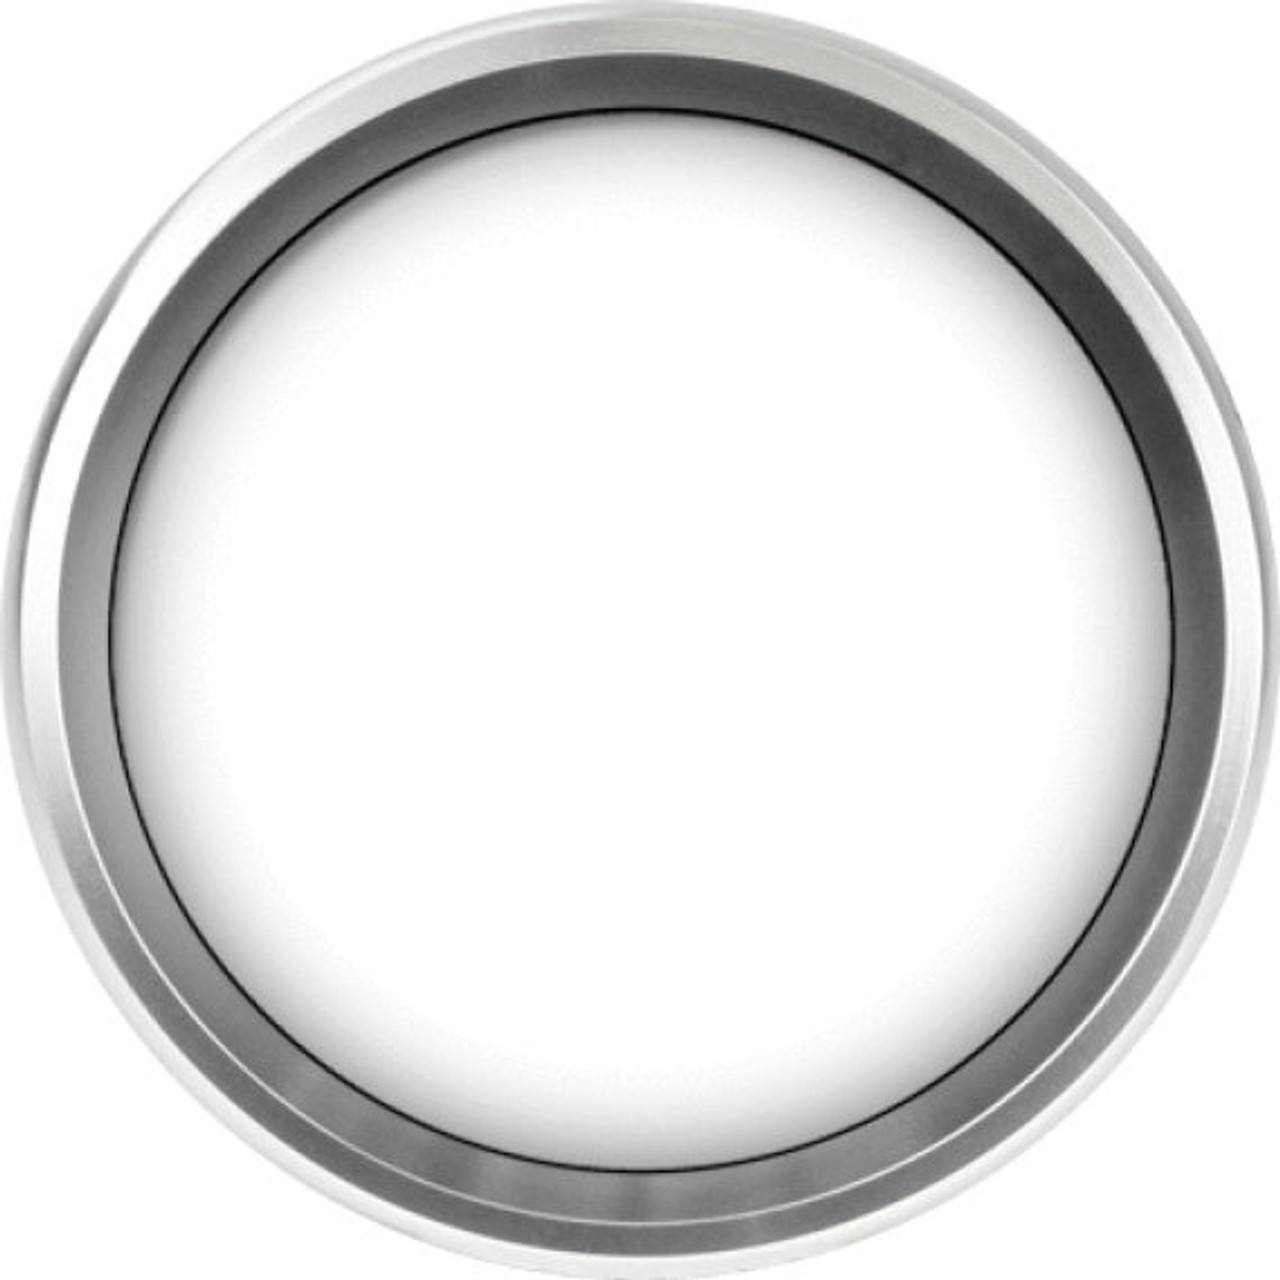 "Revolution Silver Replacement Bezel for 3-3/8"" gauge"